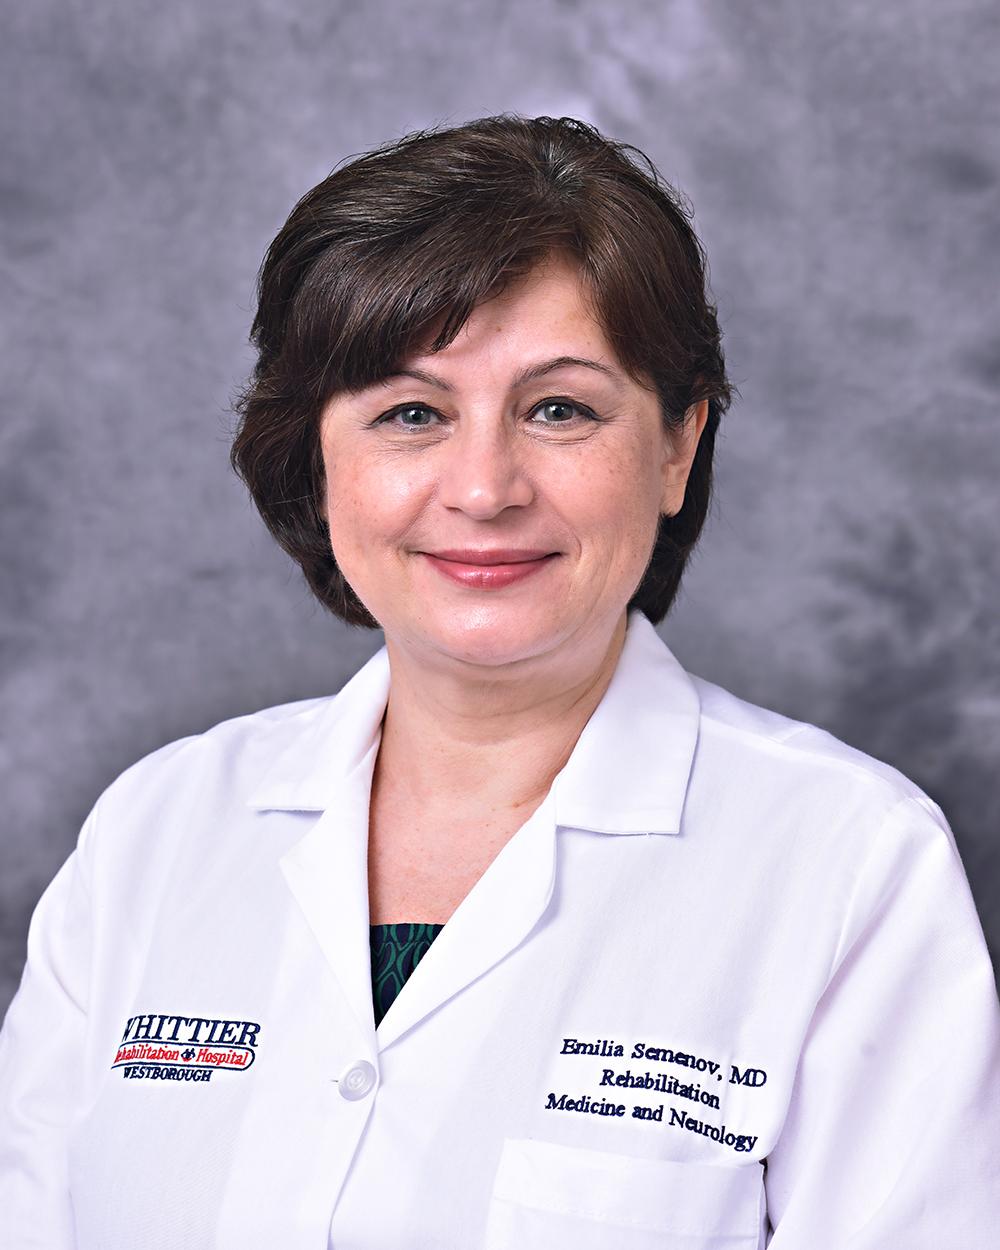 Emilia Semenov, MD, Staff Physician